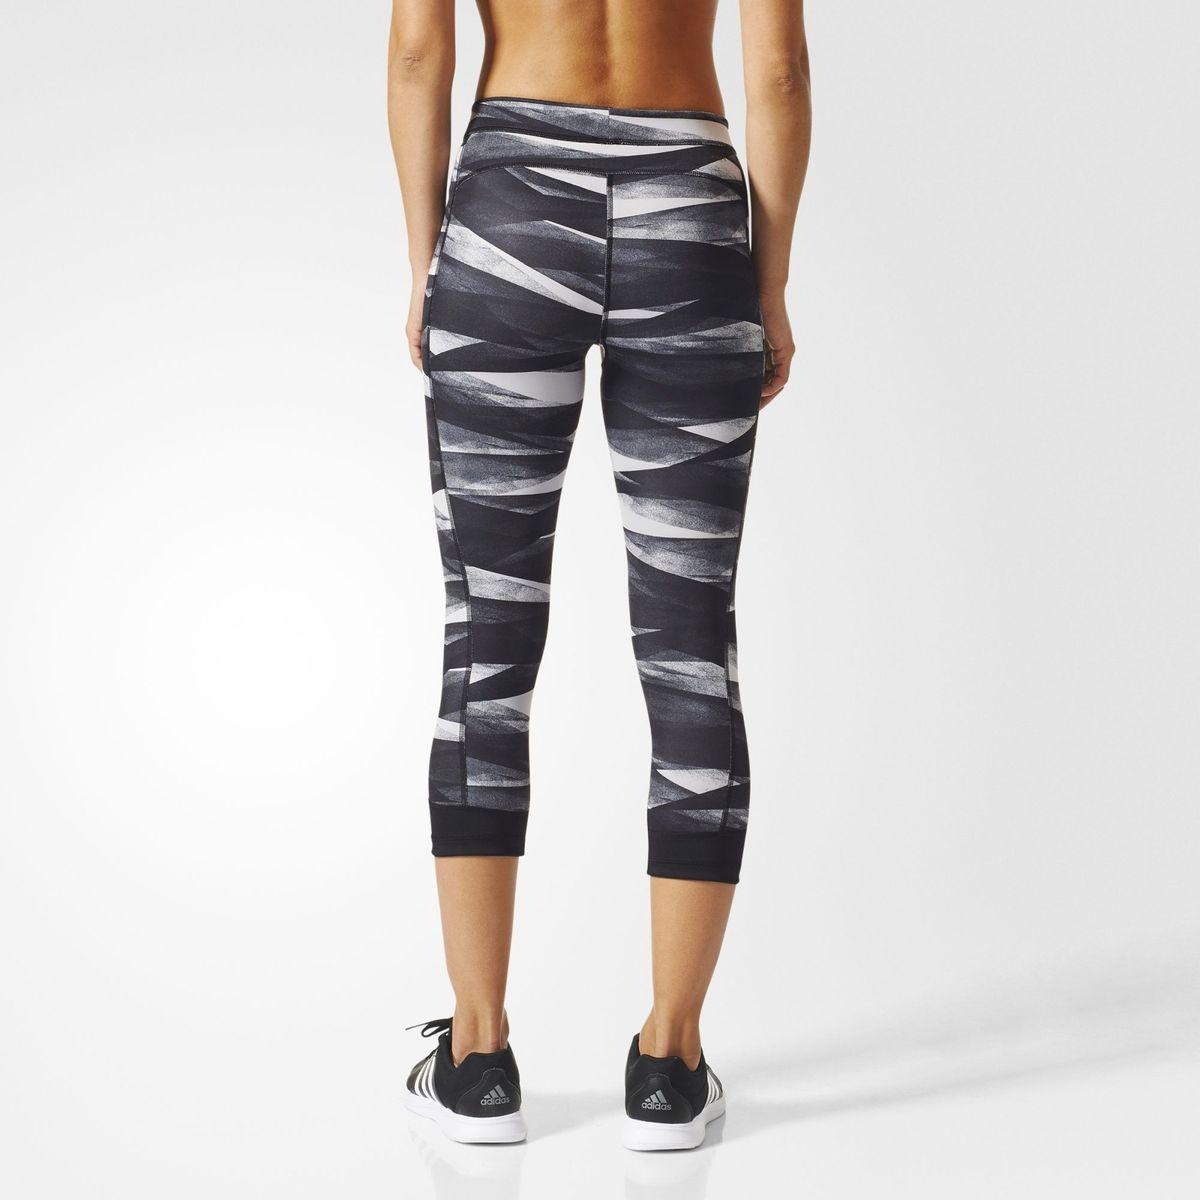 Collants 34 TECHFIT TIG | Products | Adidas, Fashion et